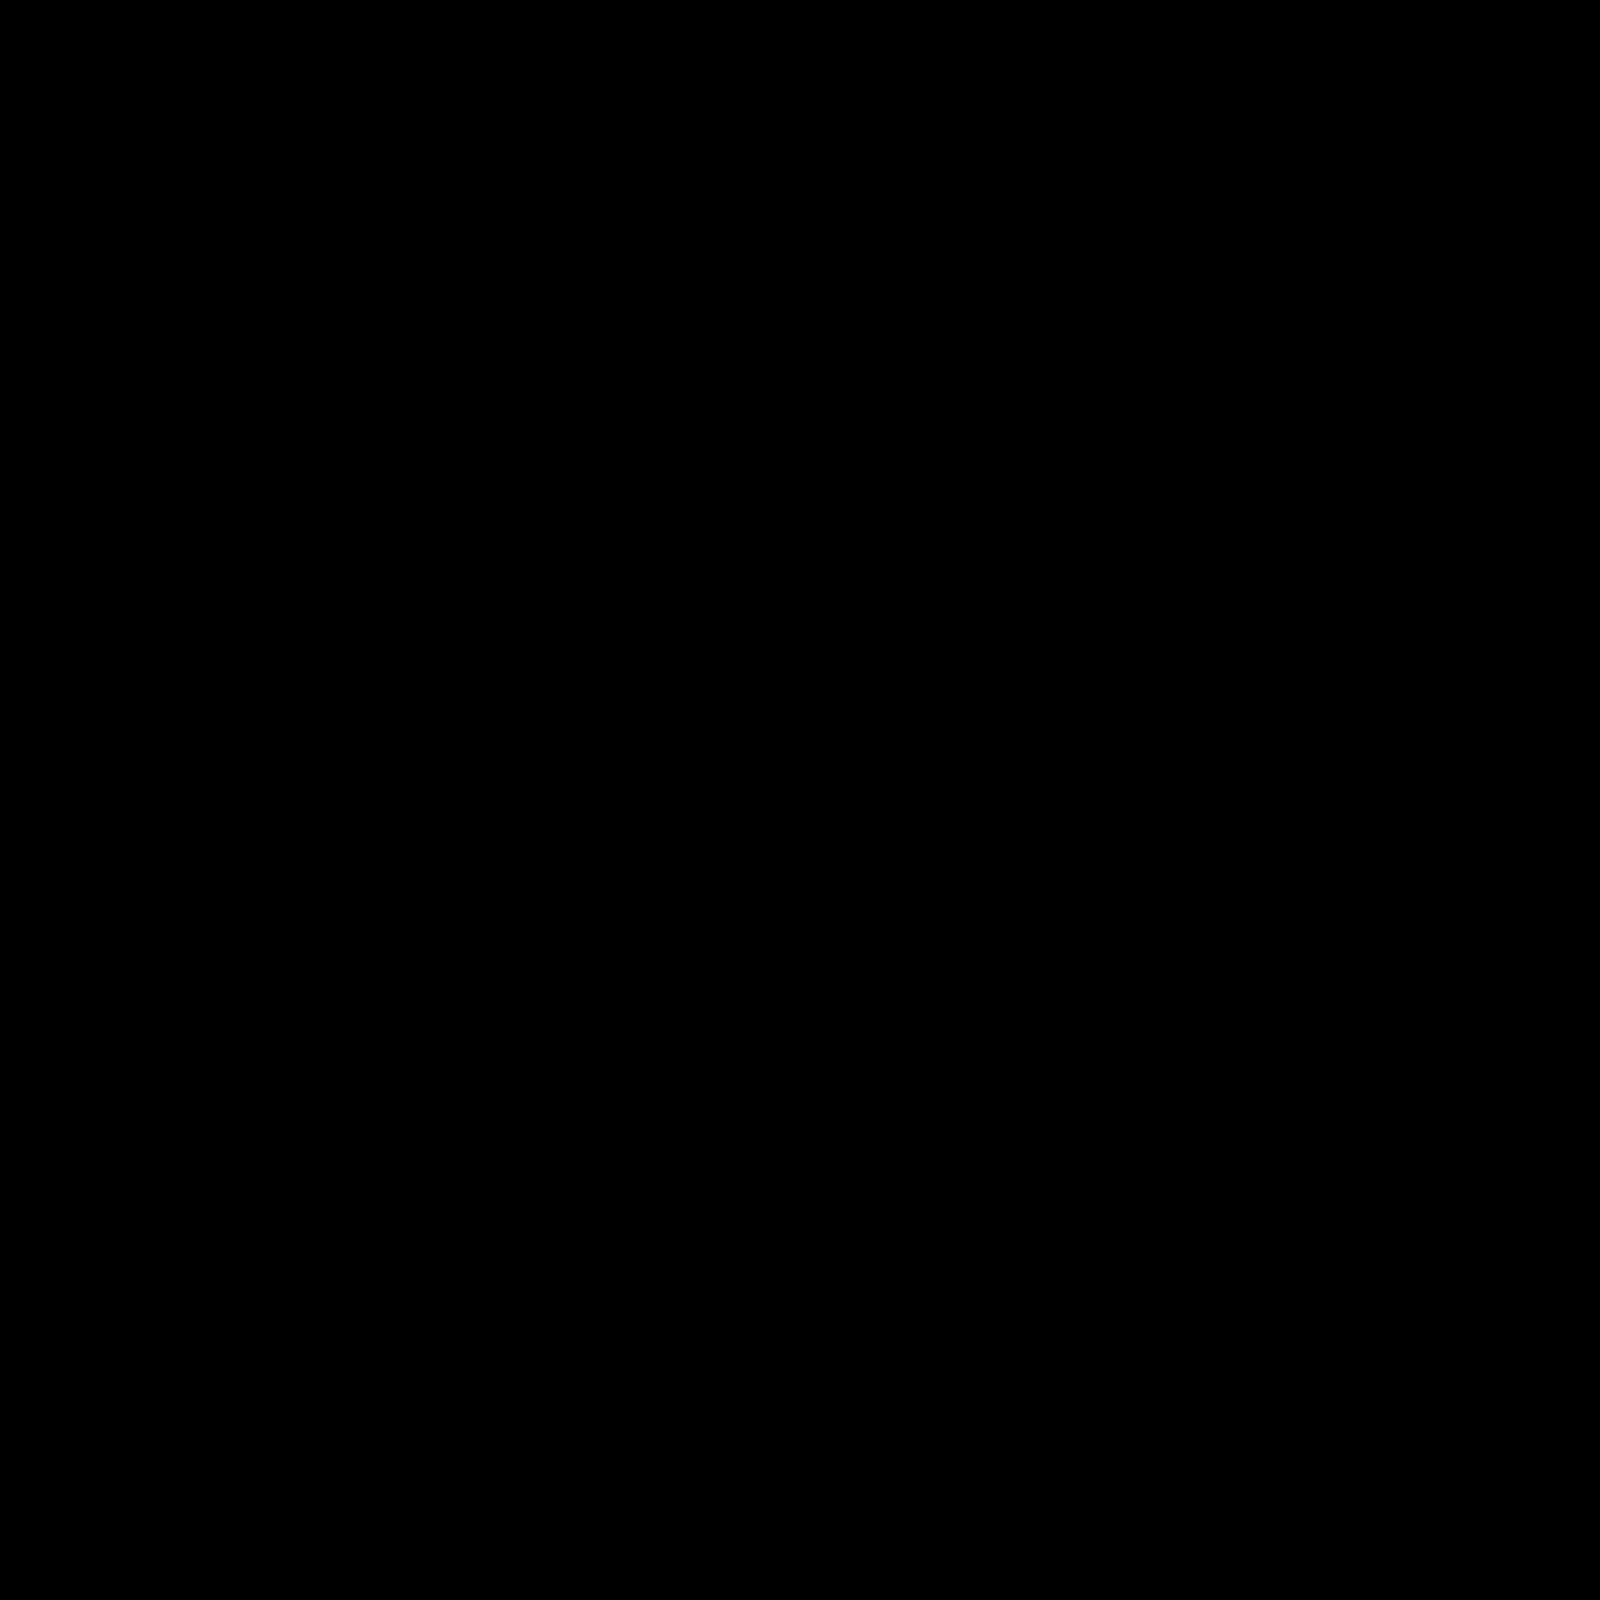 Rajstopy icon